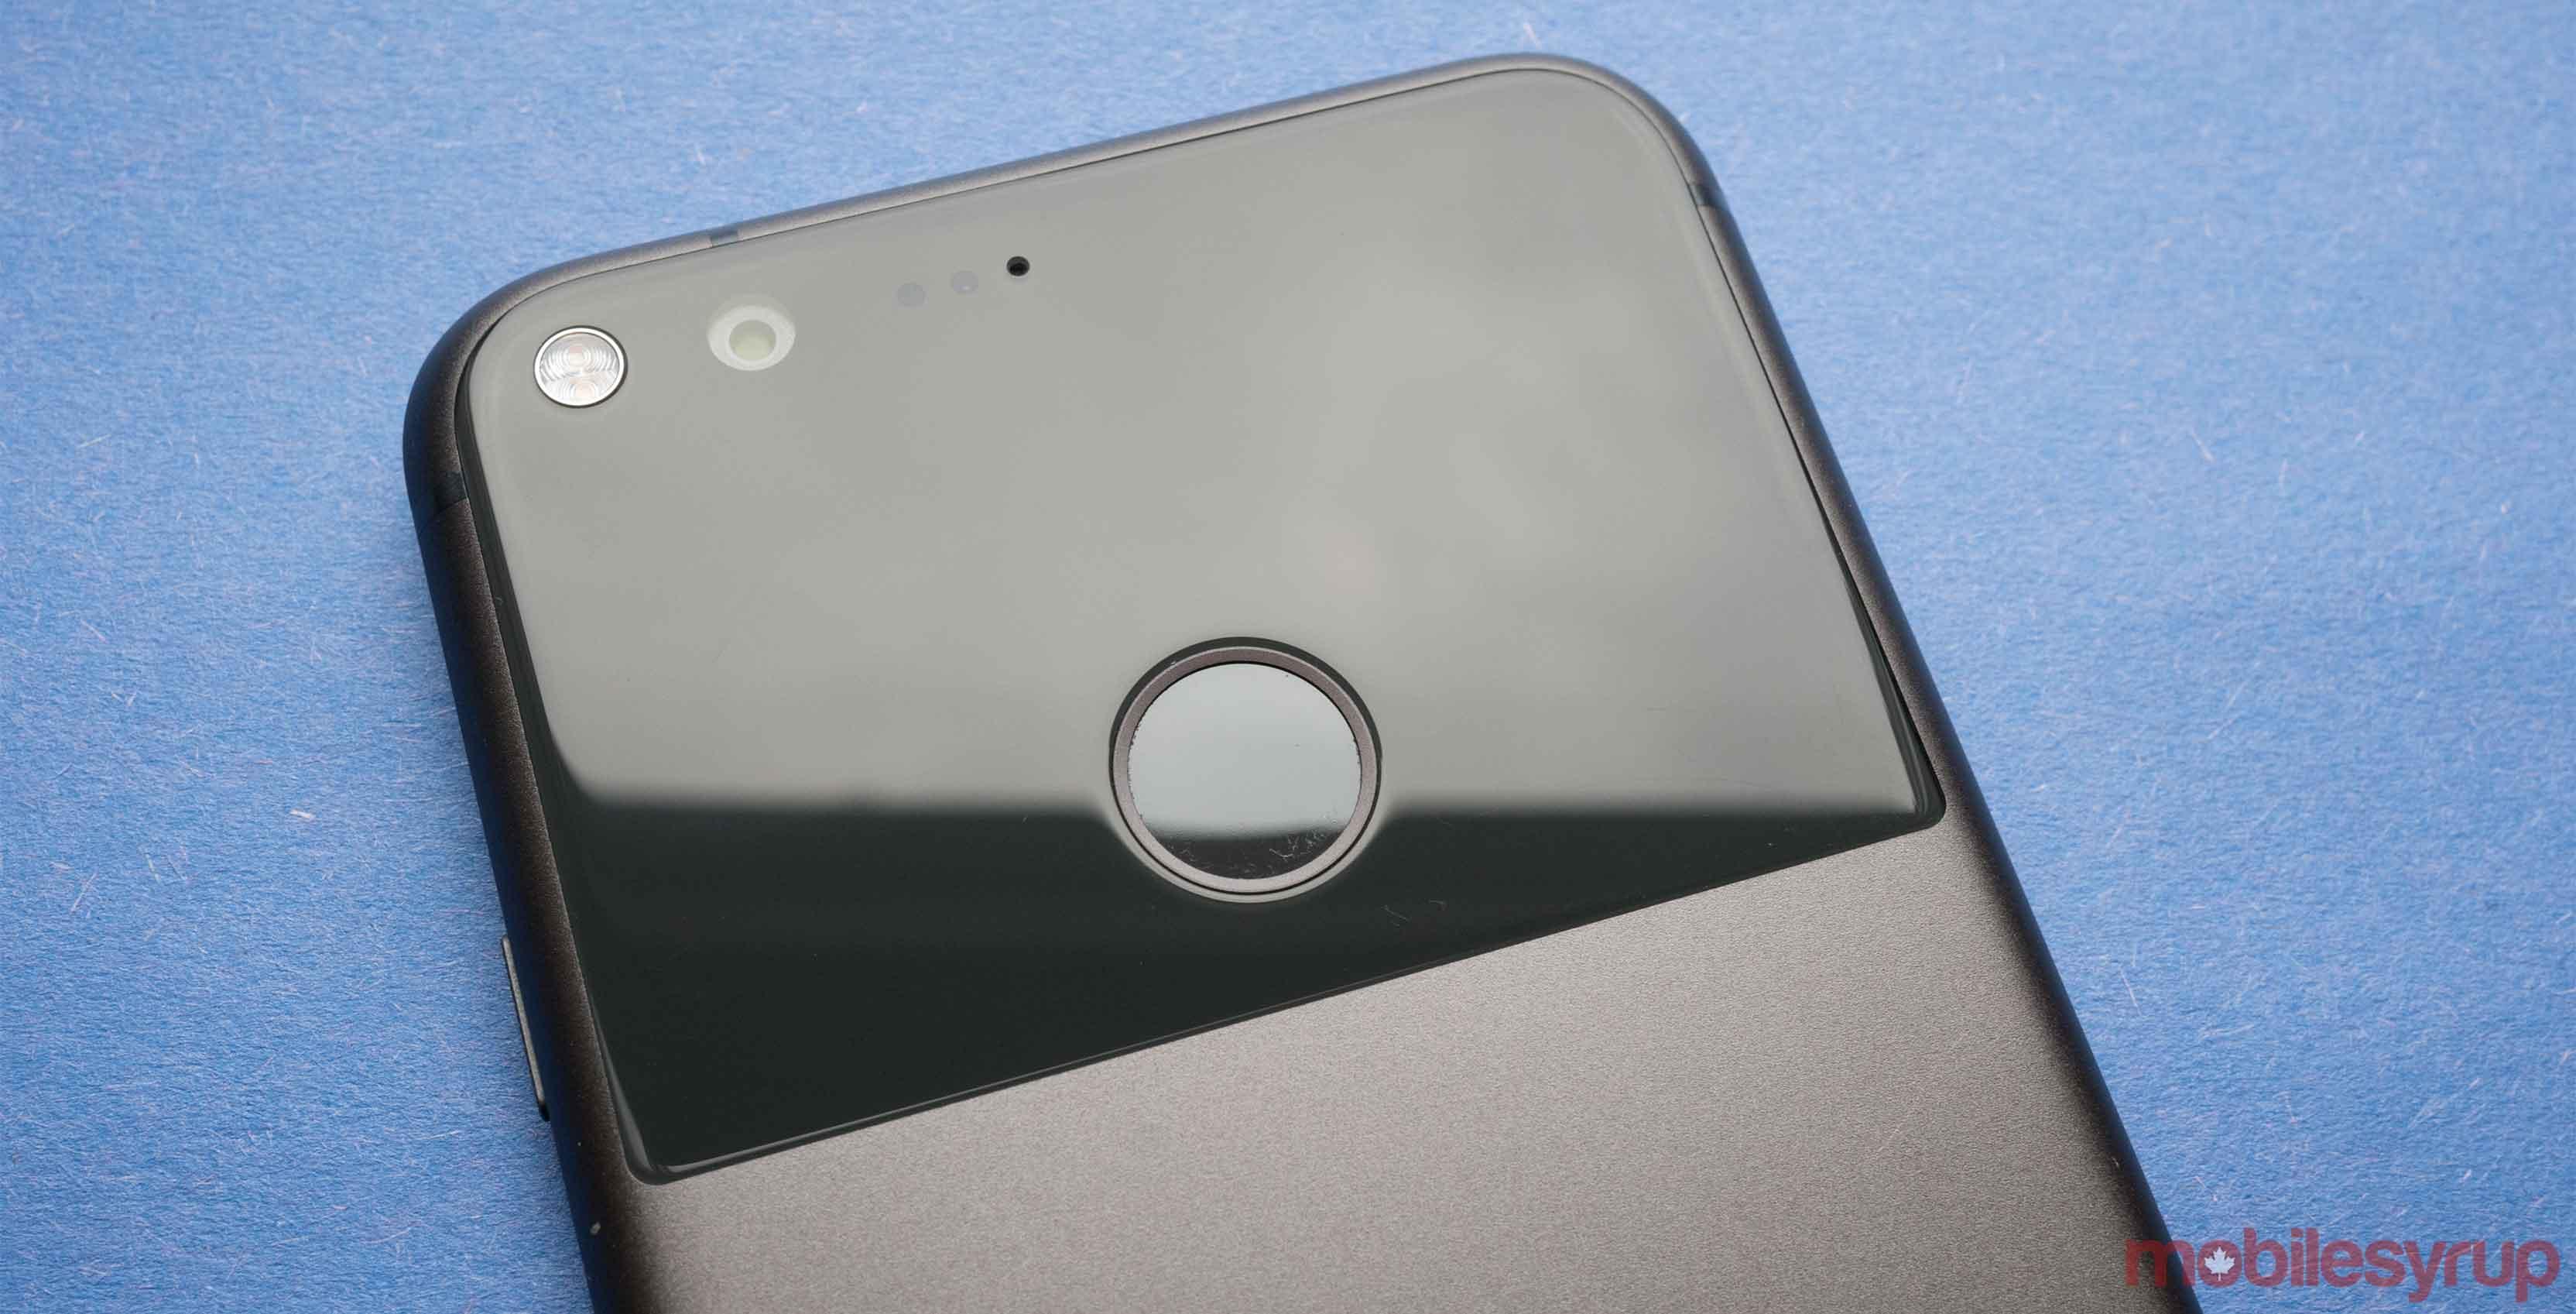 Pixel smartphone's rear